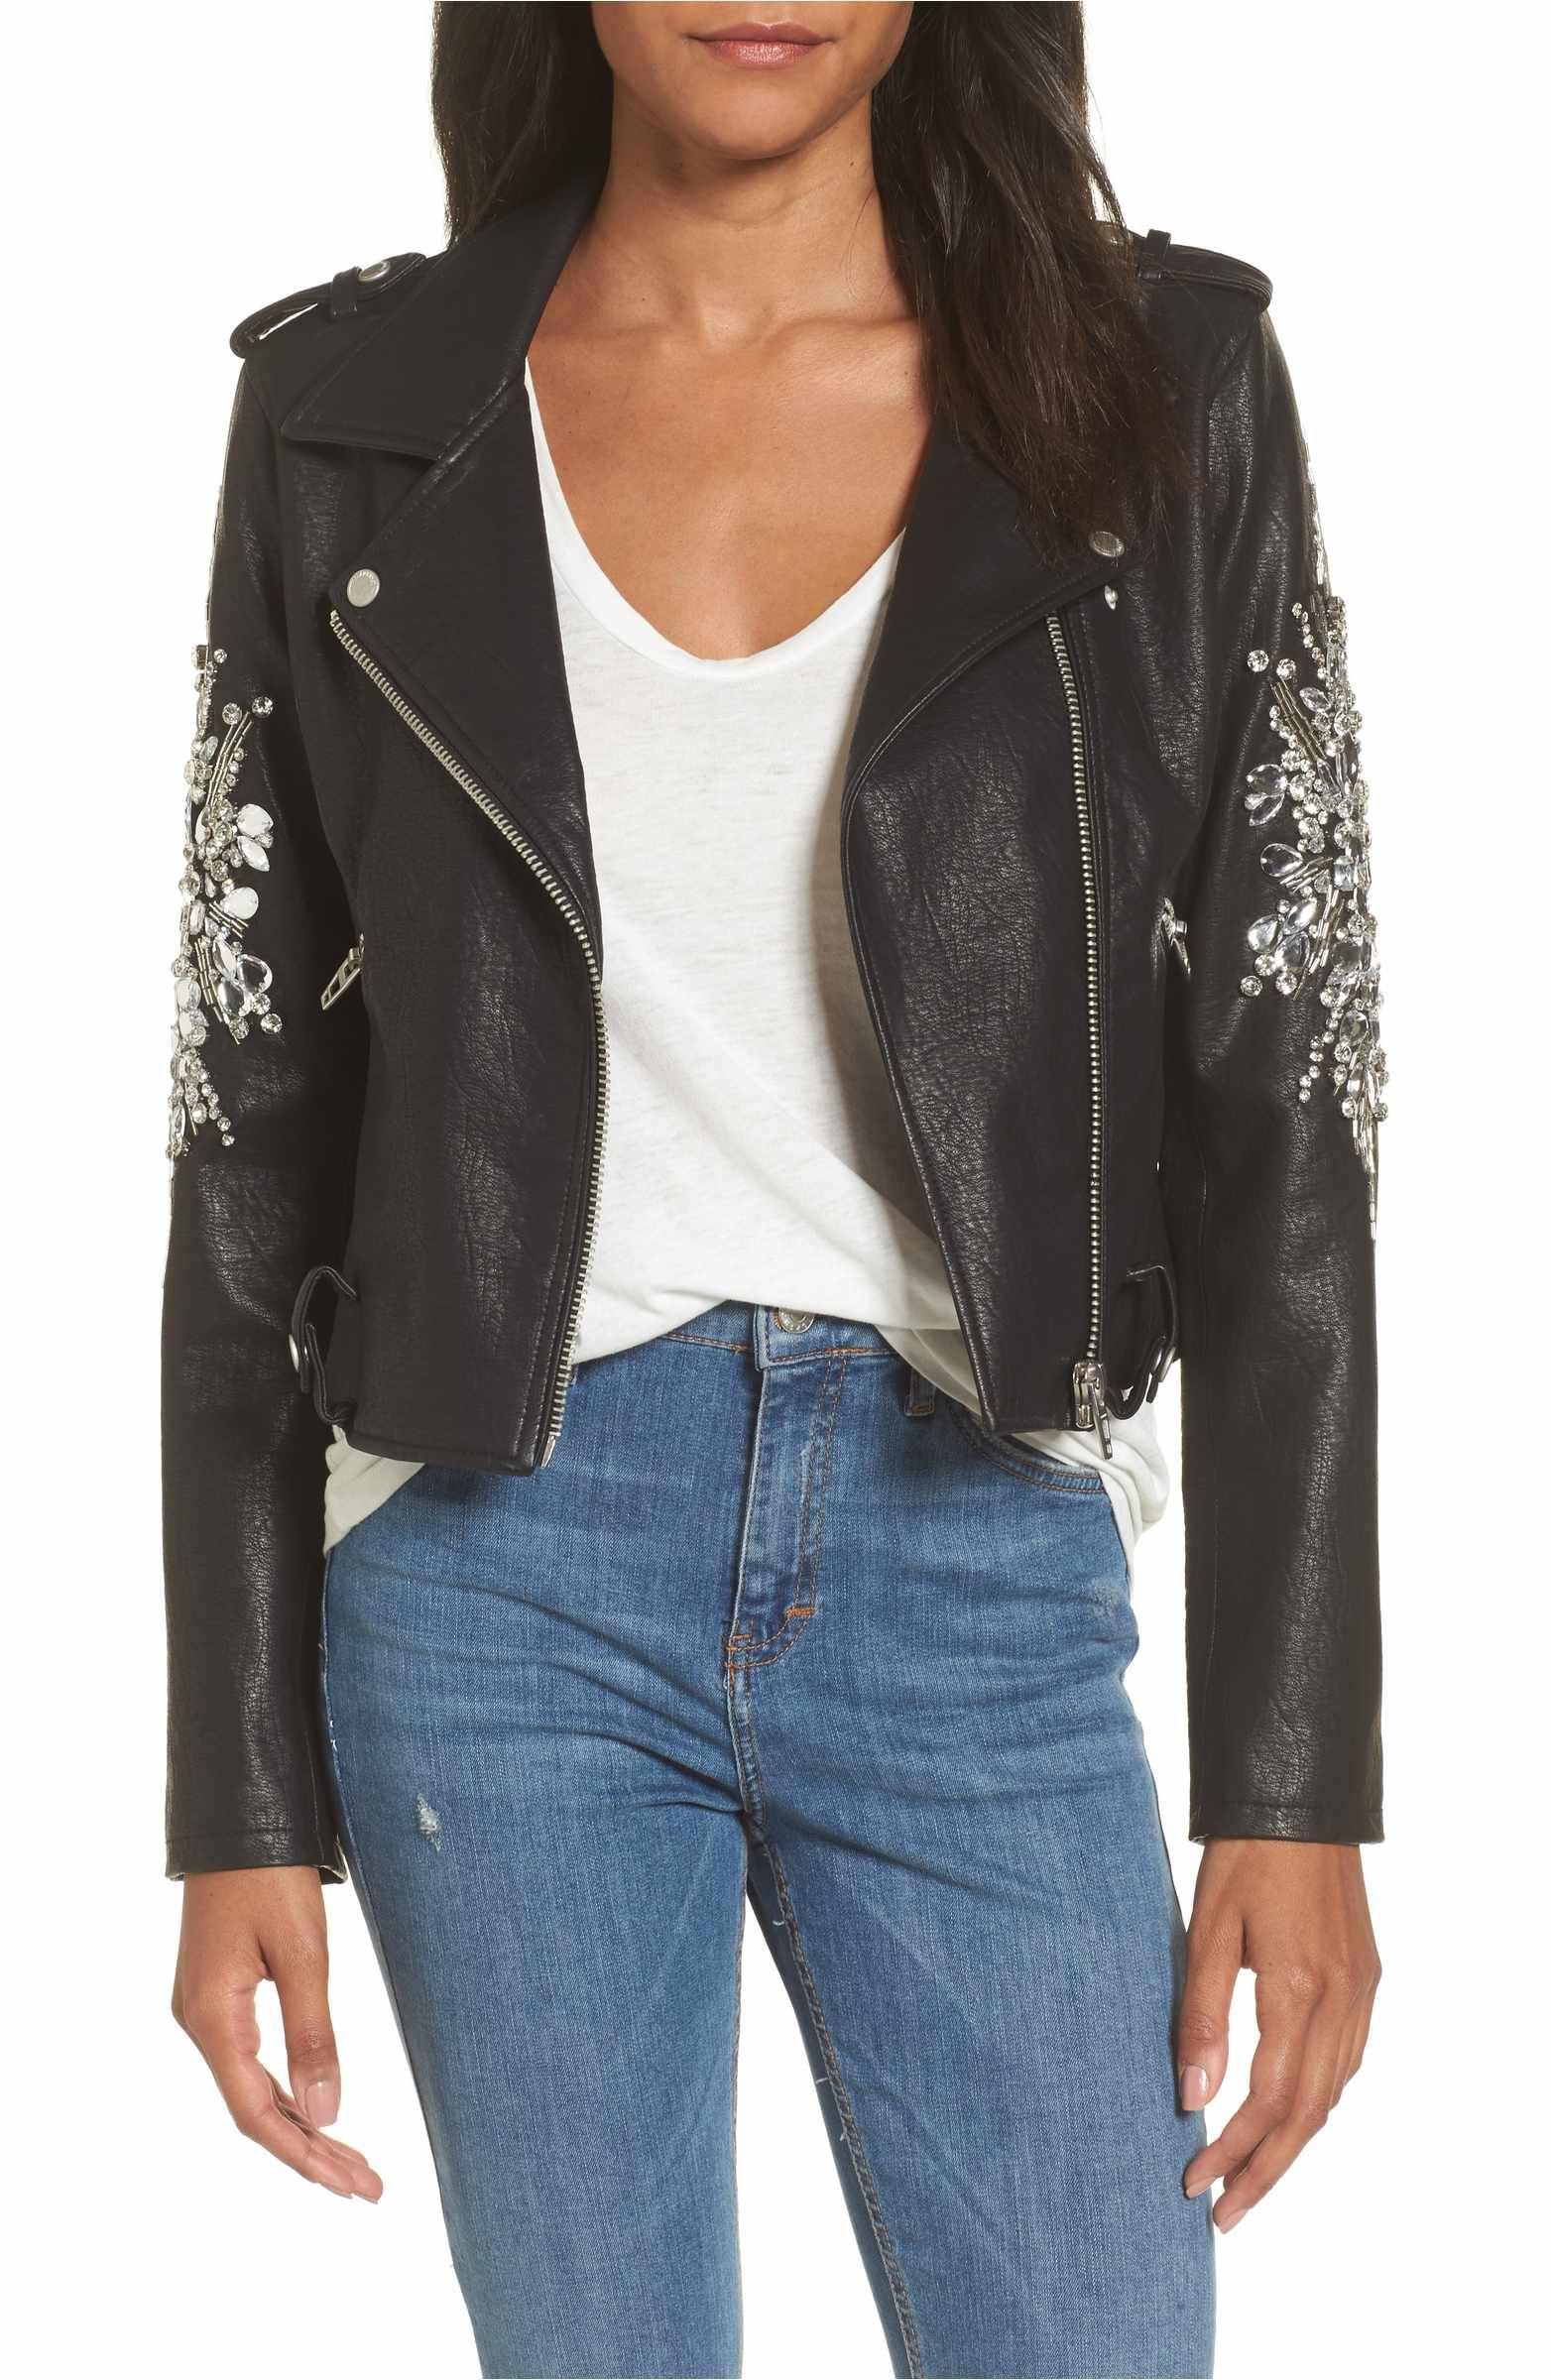 5f602b51a Main Image - BLANKNYC Embellished Faux Leather Moto Jacket | Fashion ...